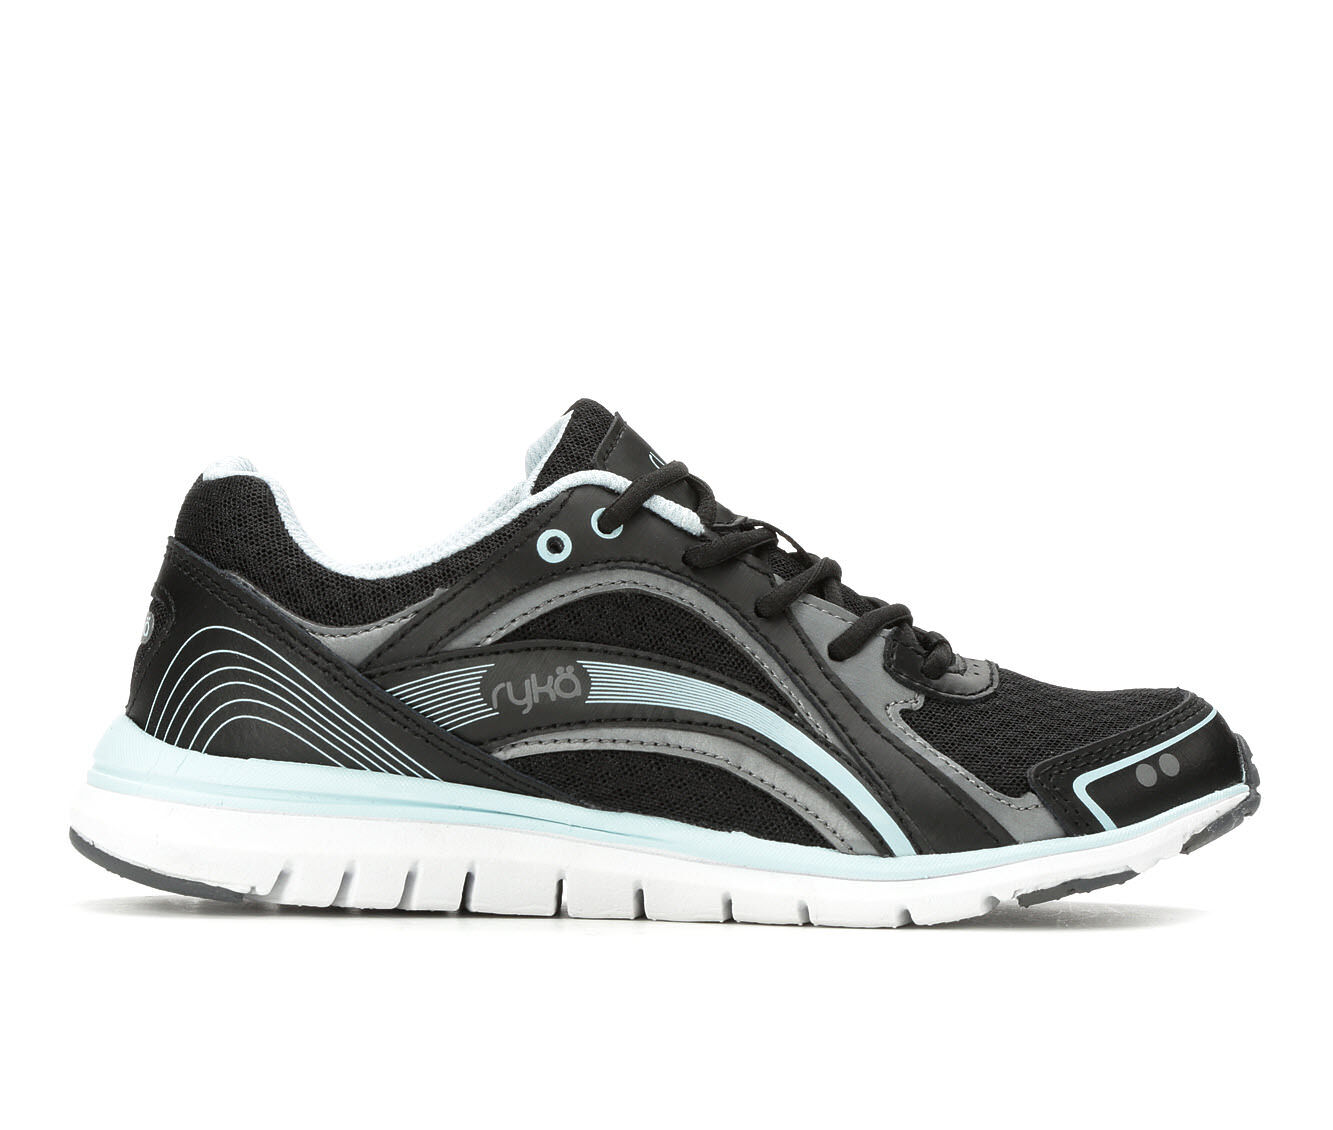 Women's Ryka Aries Training Shoes Black/Blue/Wht